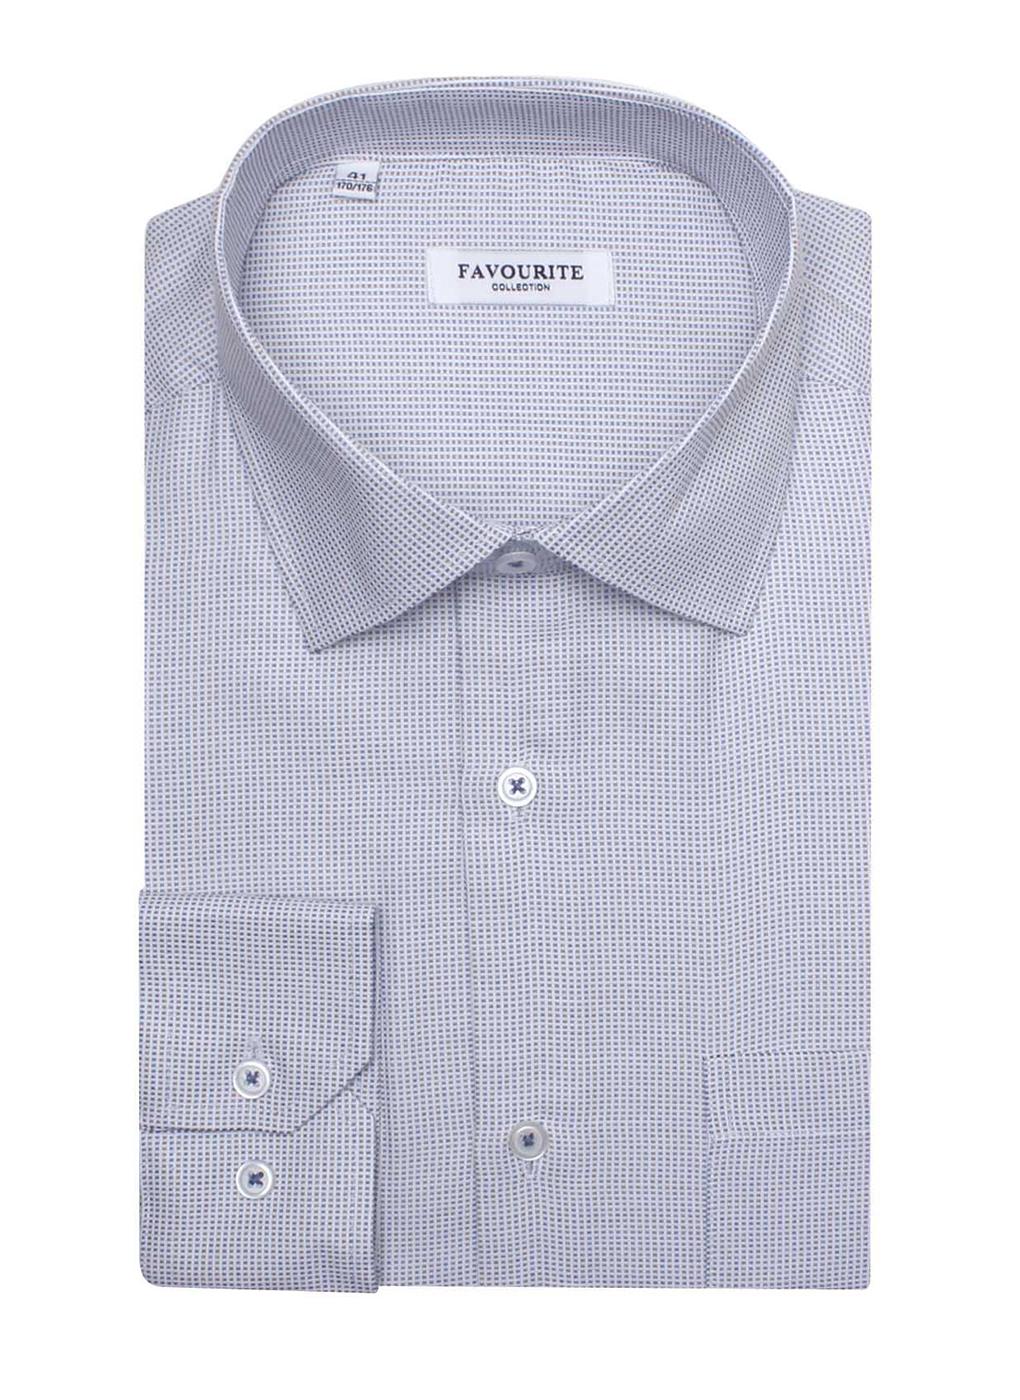 Рубашка мужская 03, Favourite фото